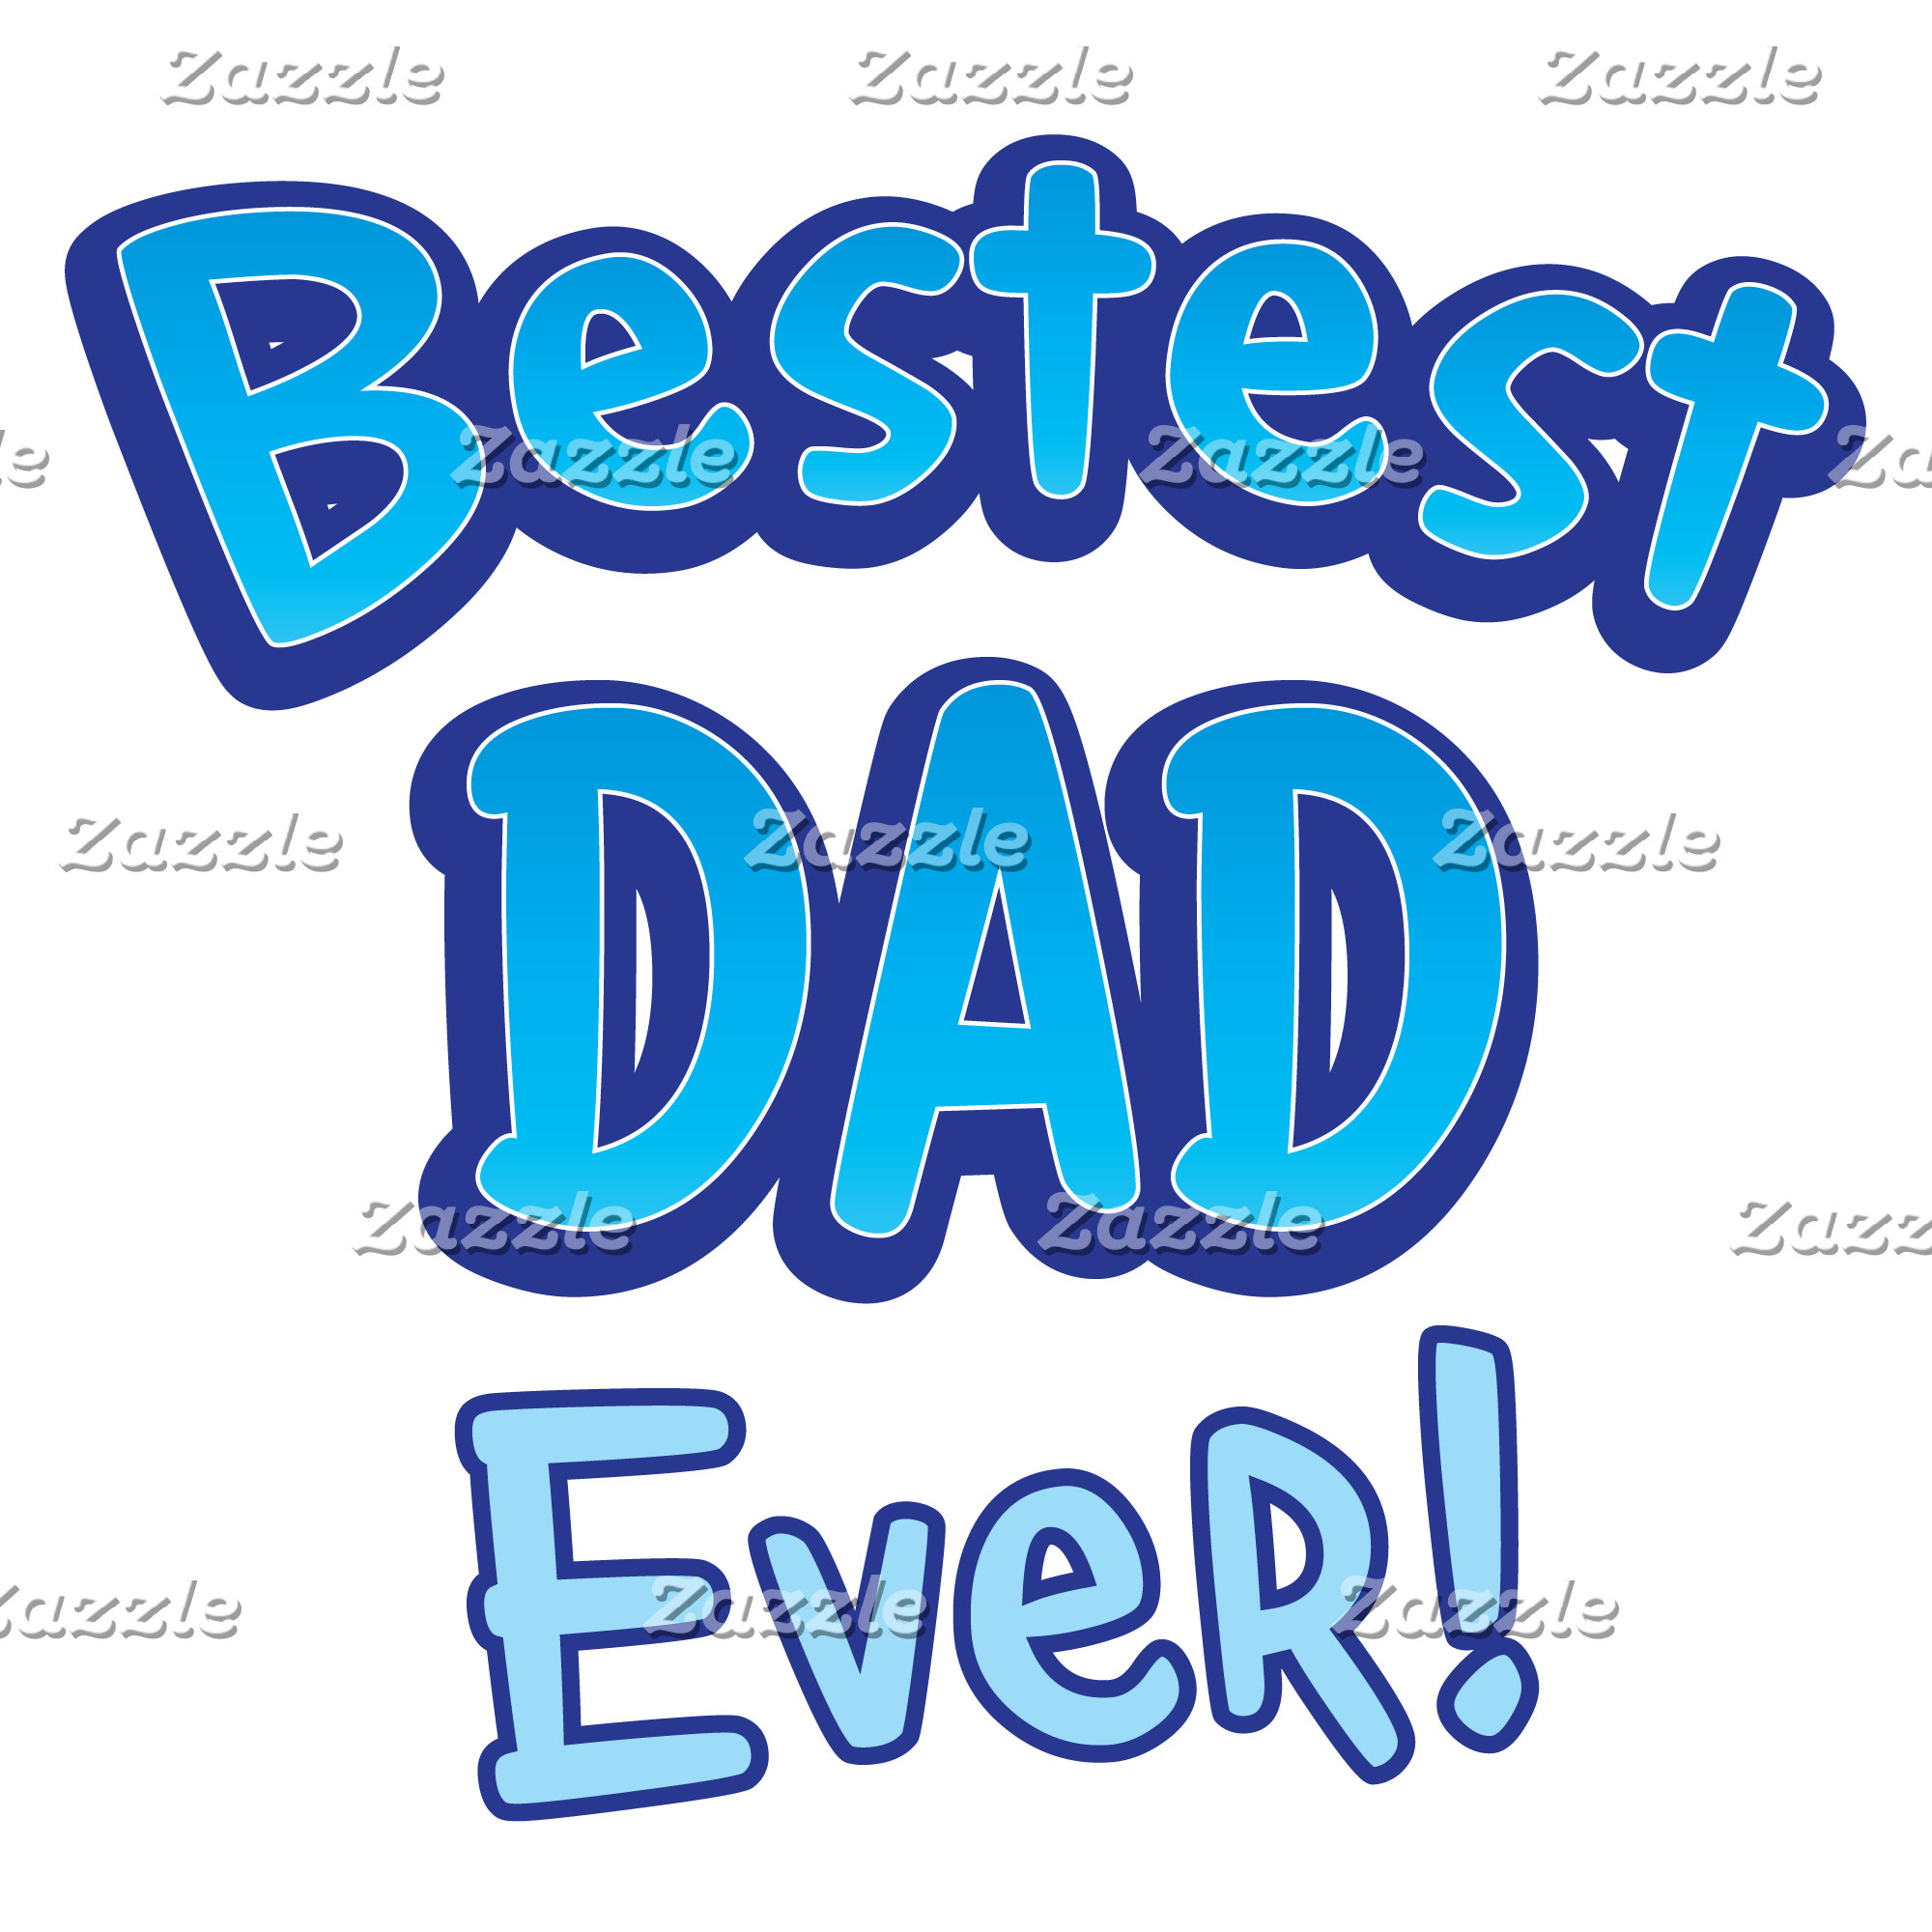 Bestest DAD ever